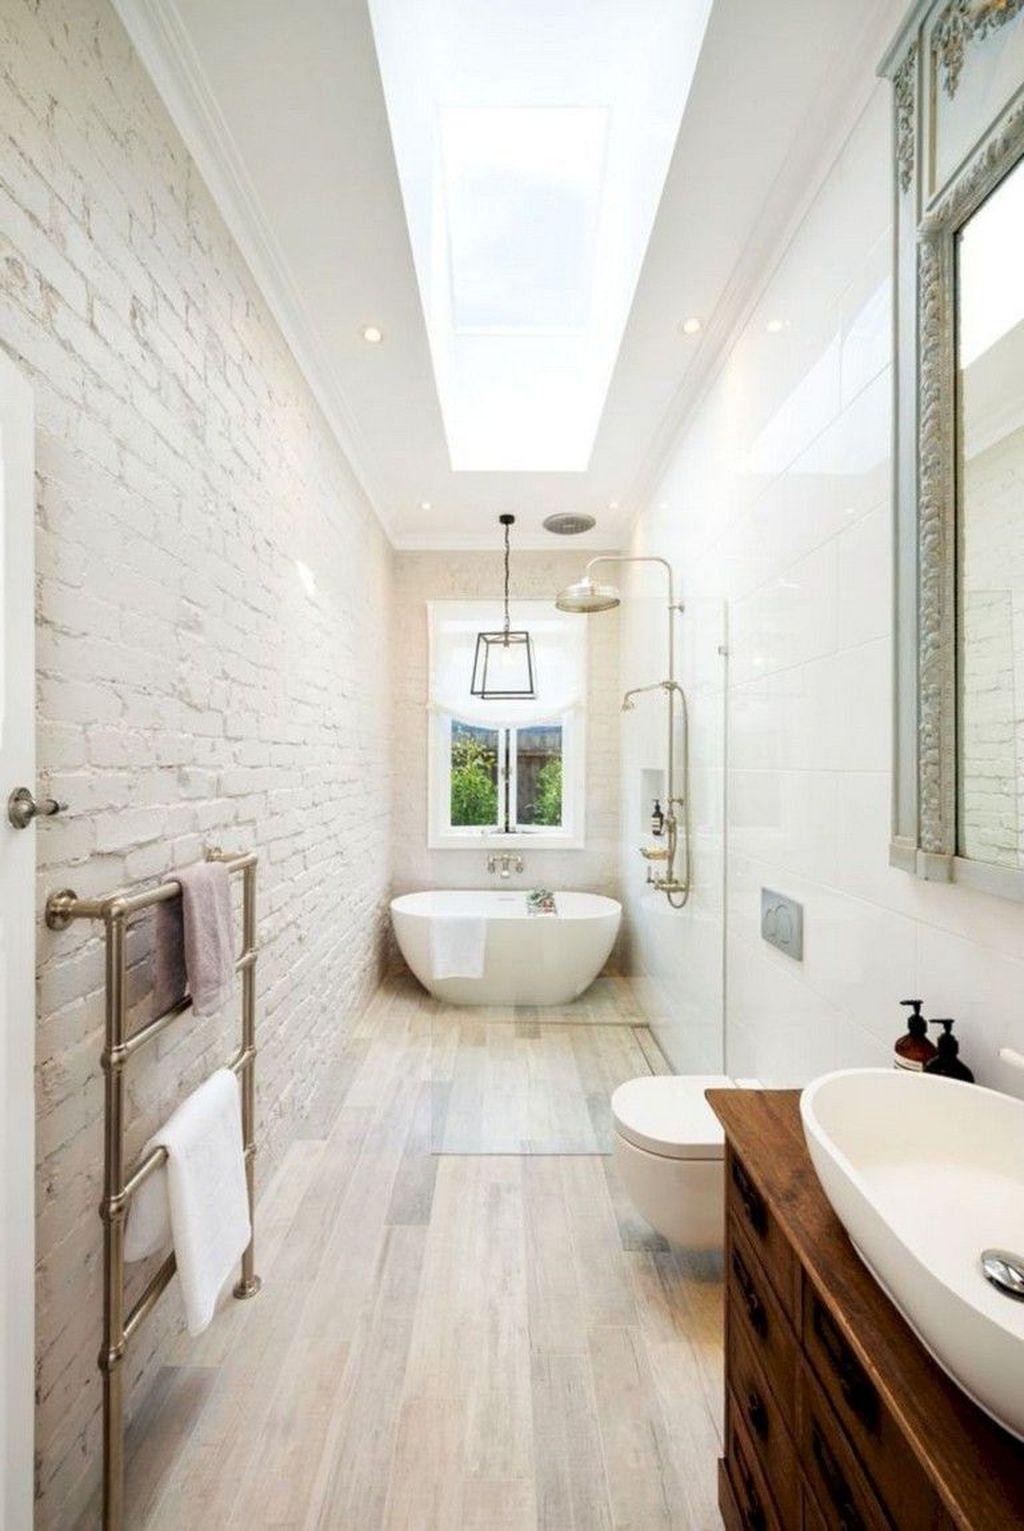 33 Admirable Luxury Bathroom Design Ideas In 2020 Long Bathroom Design Long Narrow Bathroom Narrow Bathroom Designs